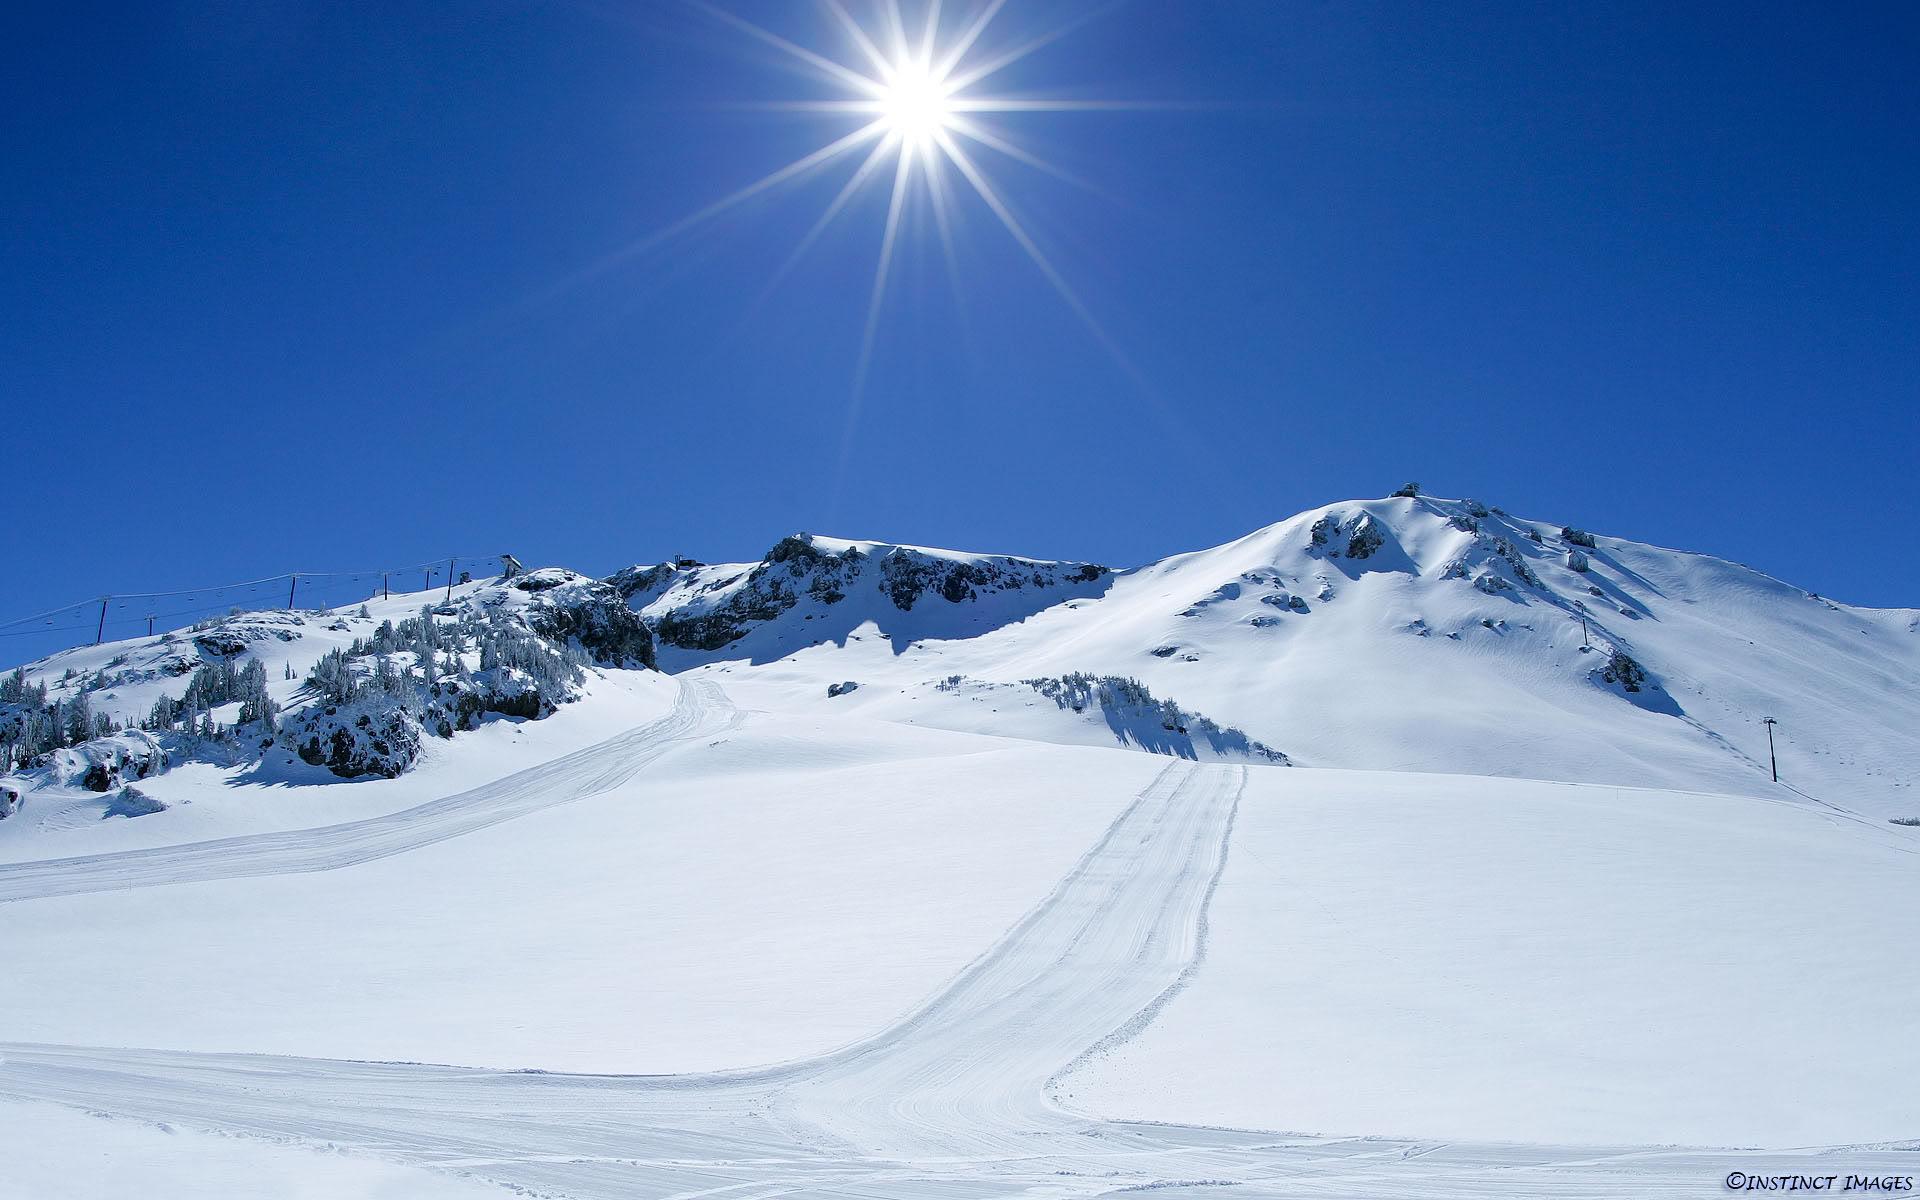 Зима, снег, сугробы, фото